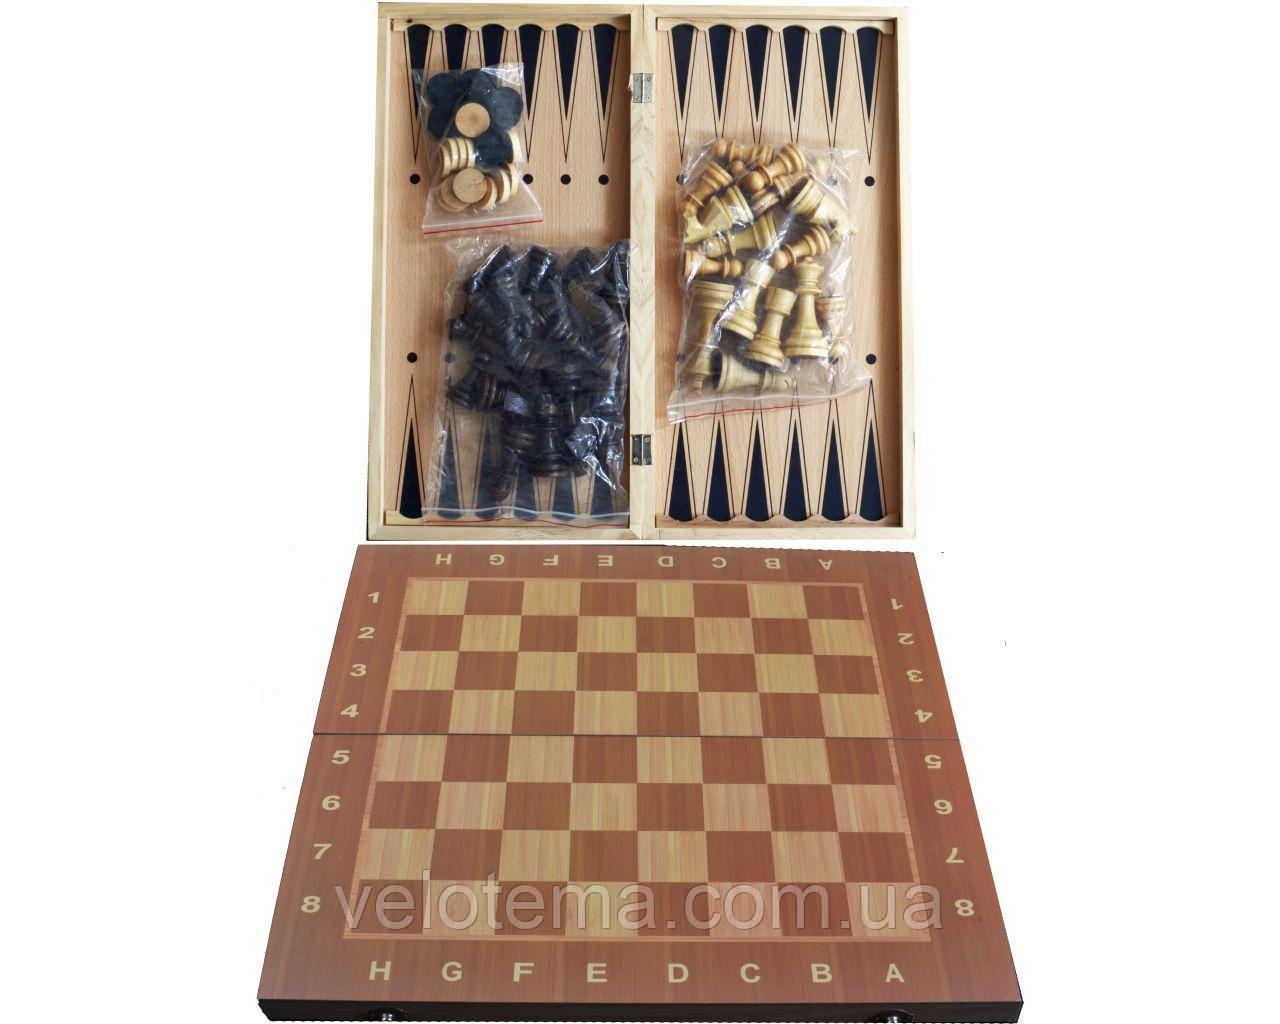 Набор 3в1 Нарды,Шахматы,Шашки (24х24см) W7721